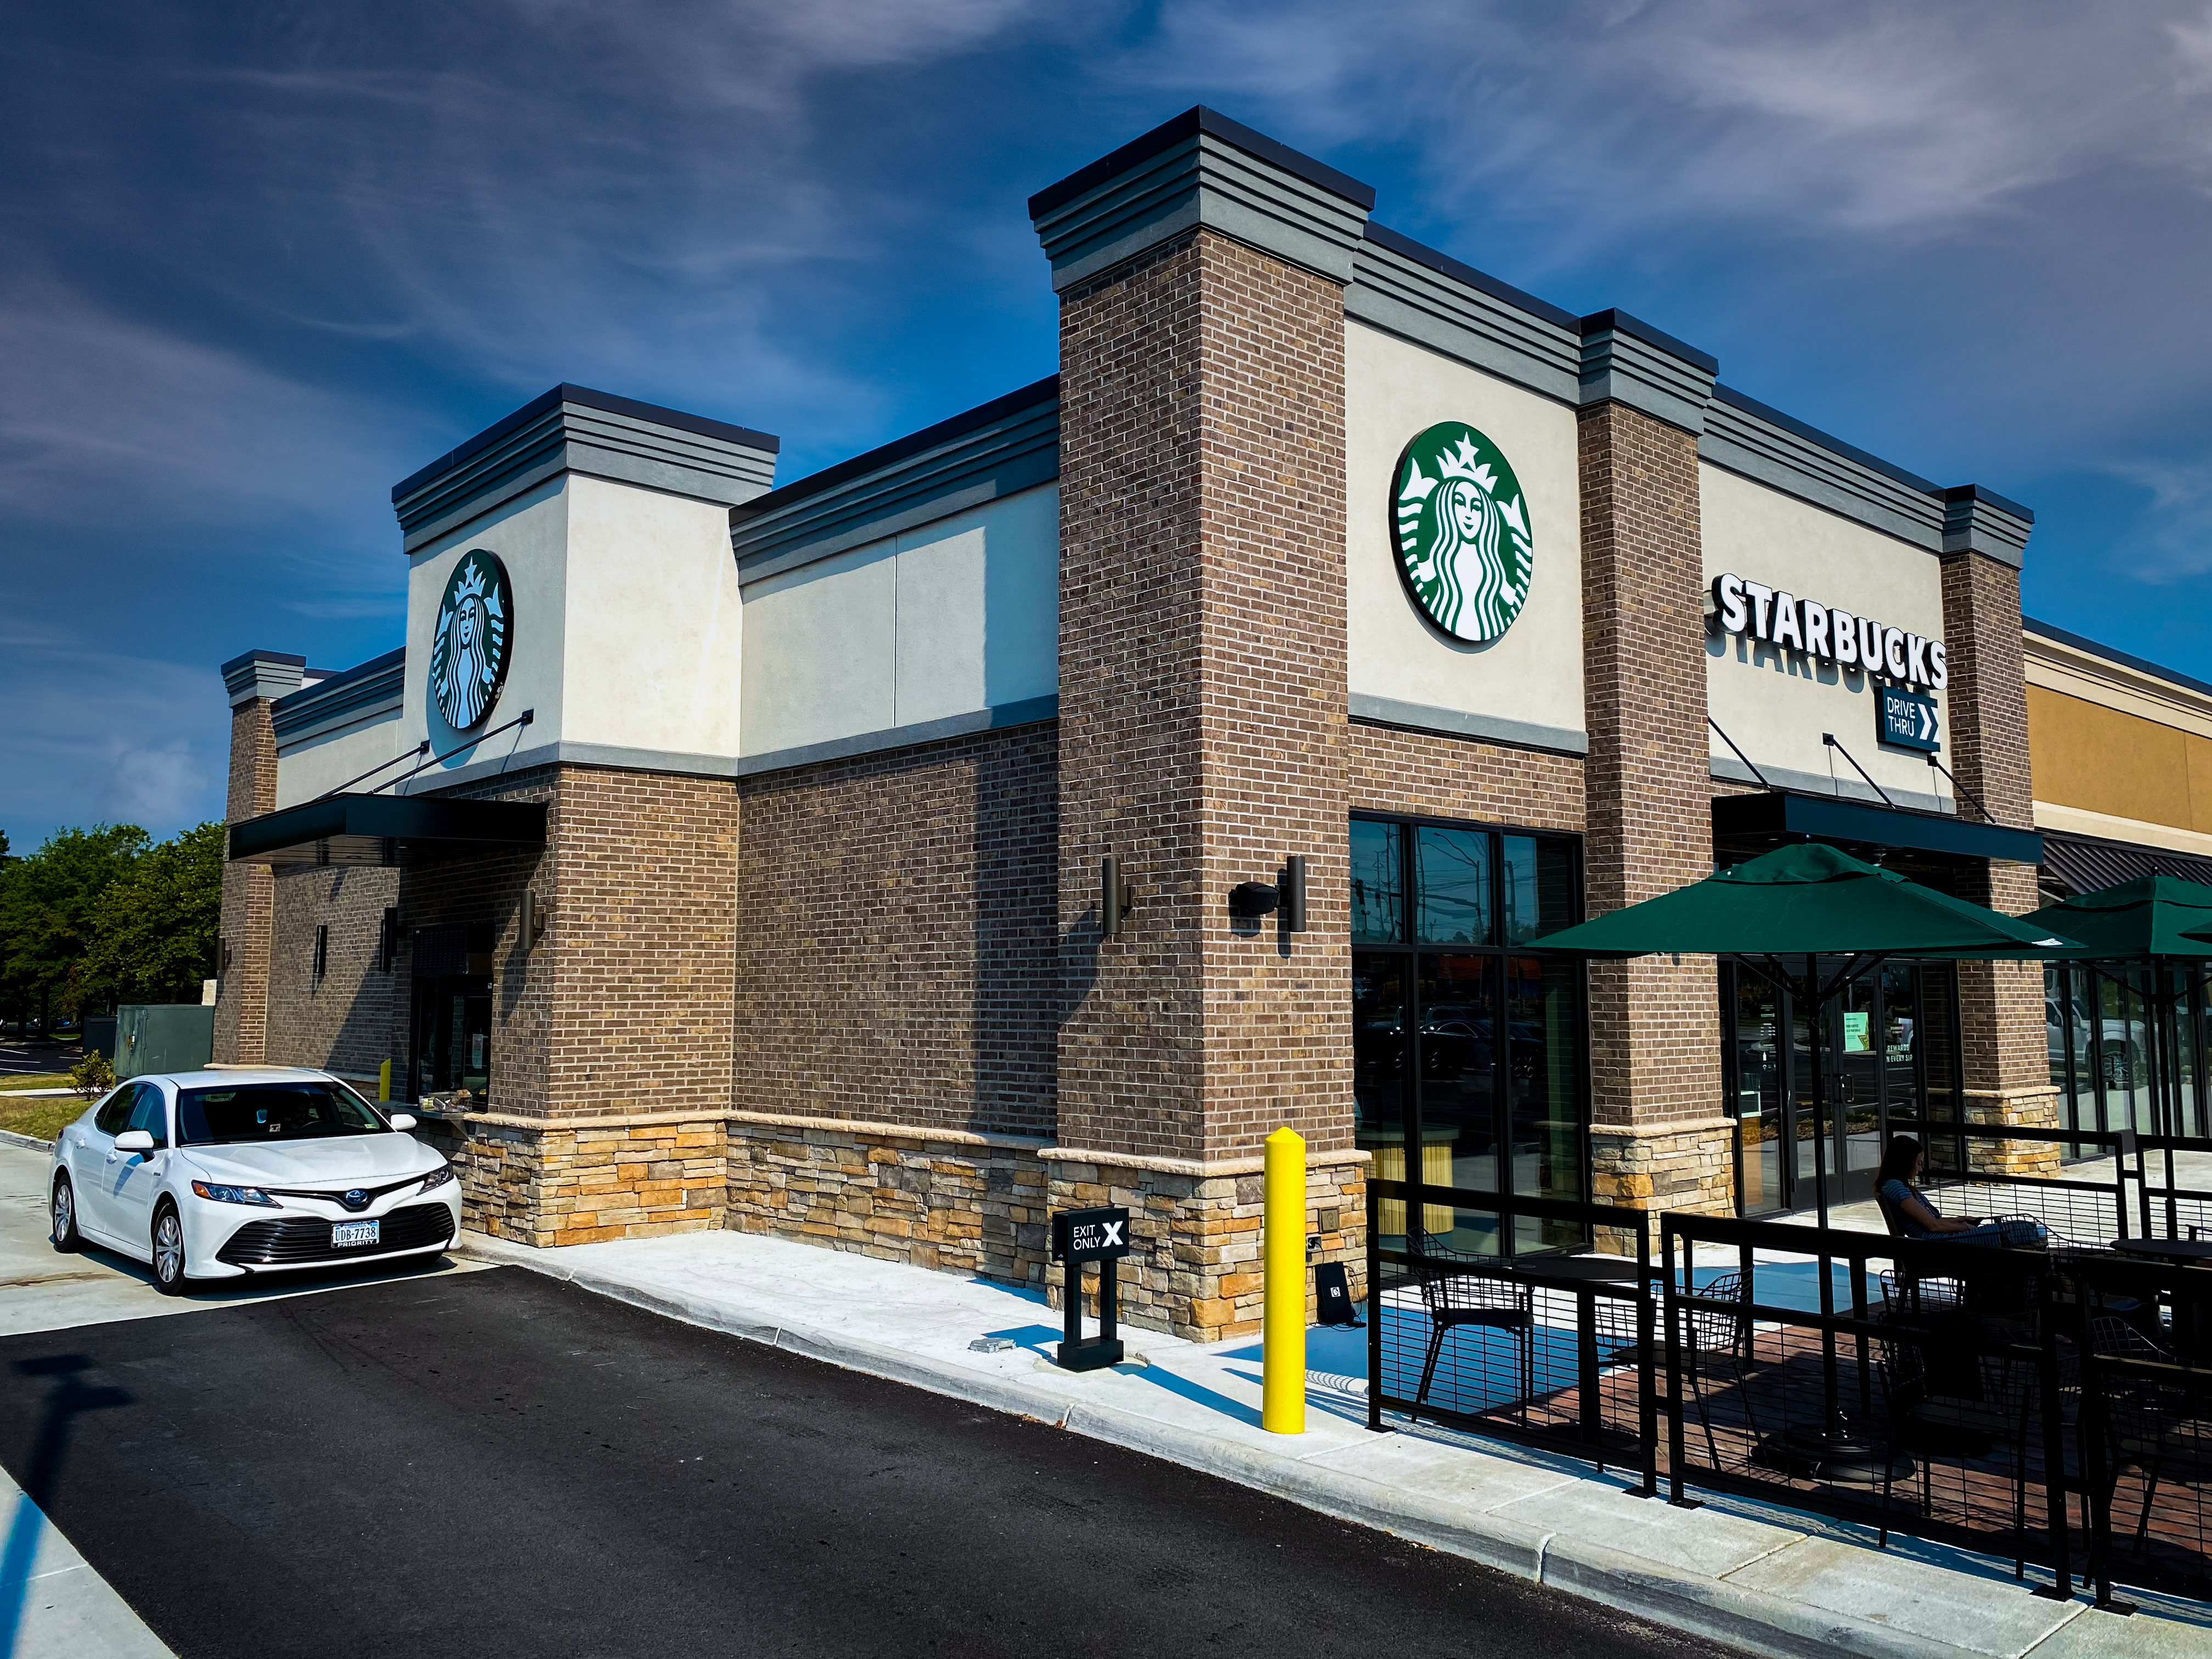 Starbucks outdoor seating area and drive-thru in Virginia Beach